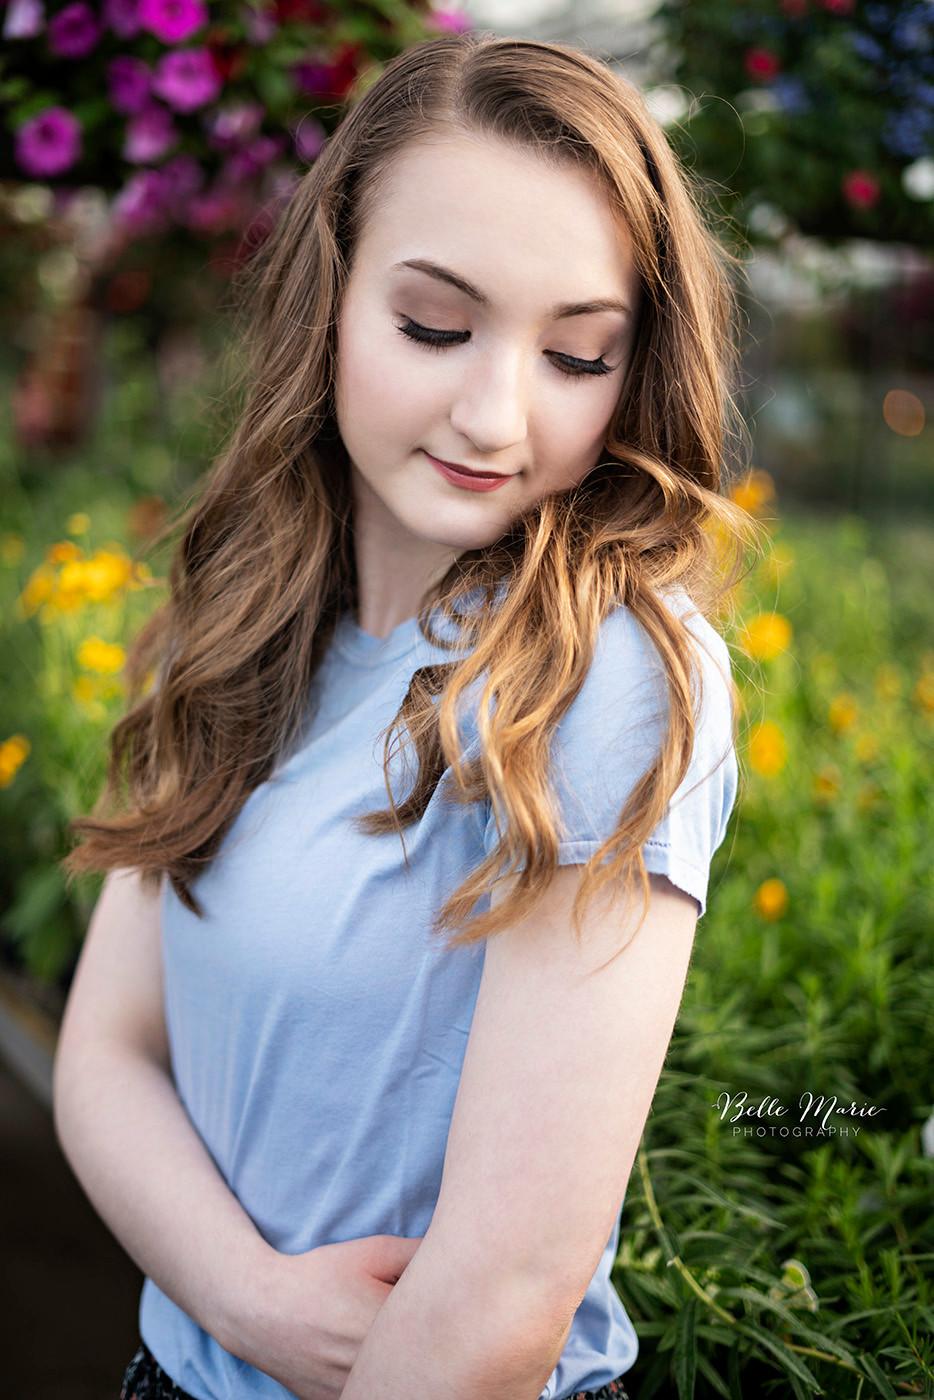 Minneapolis hair and makeup artist